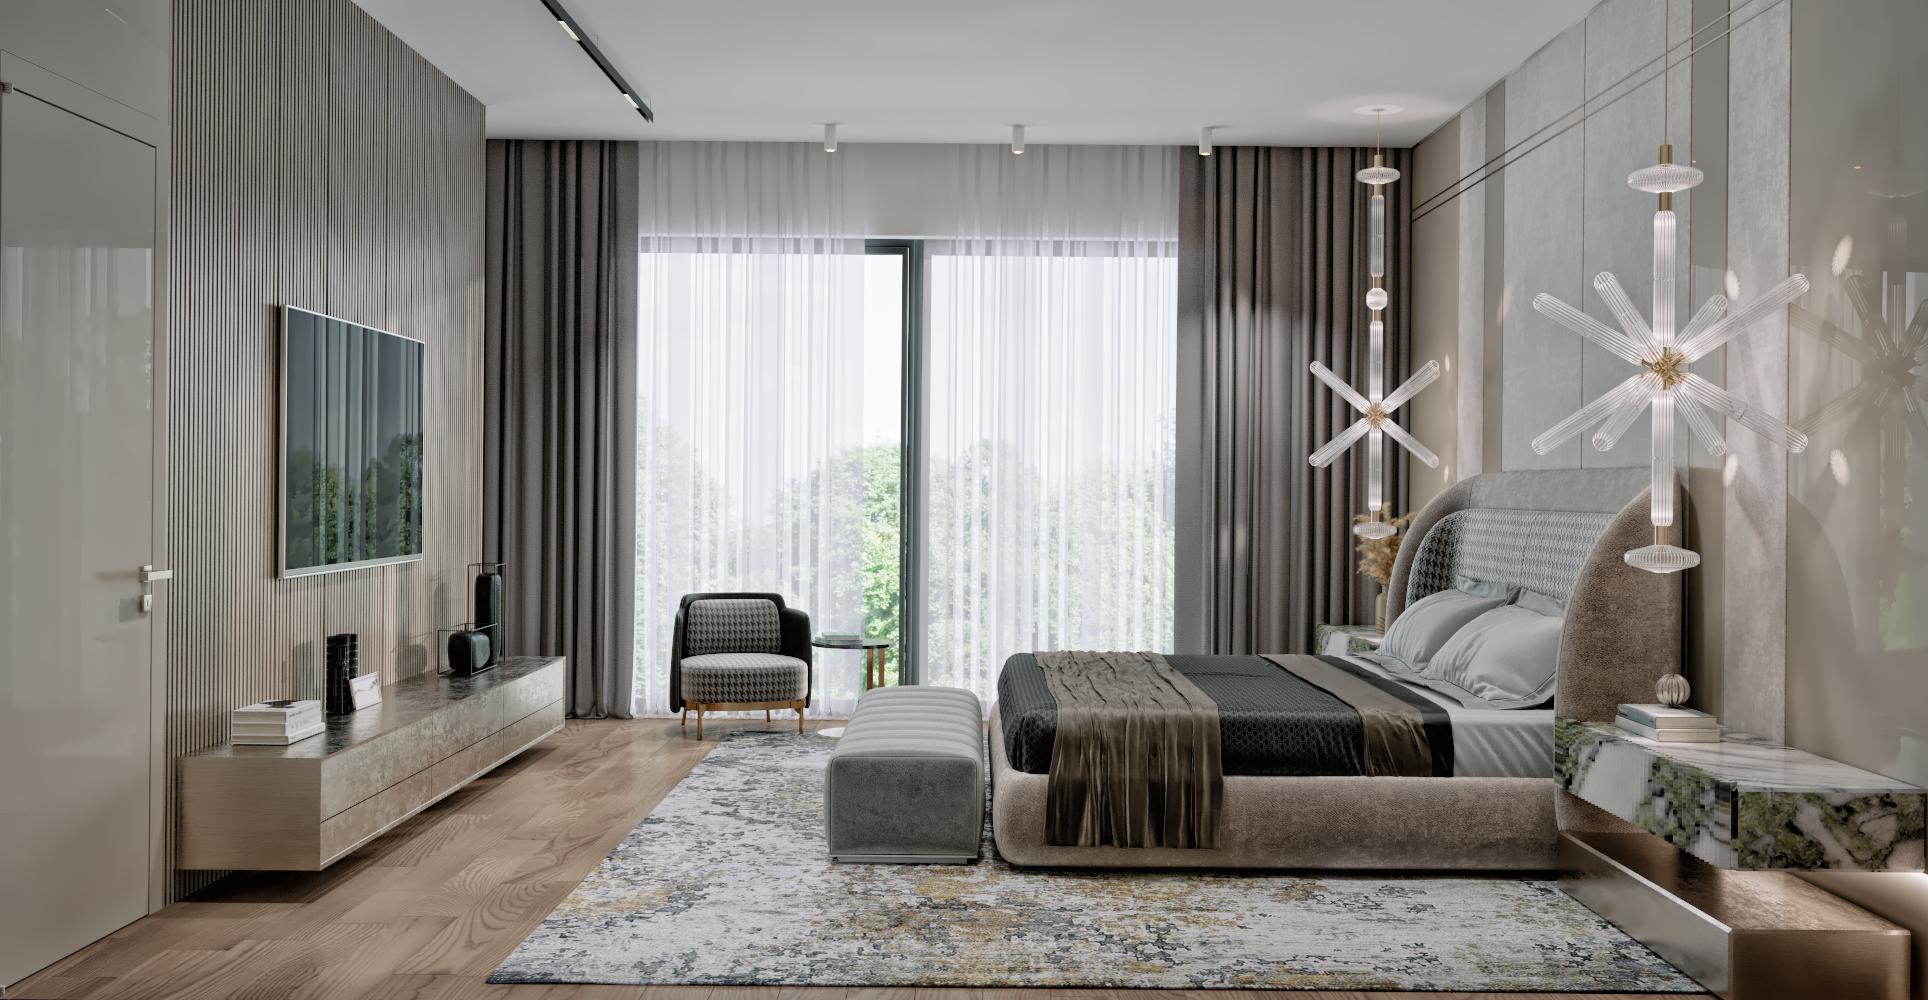 Bedroom penthouse.